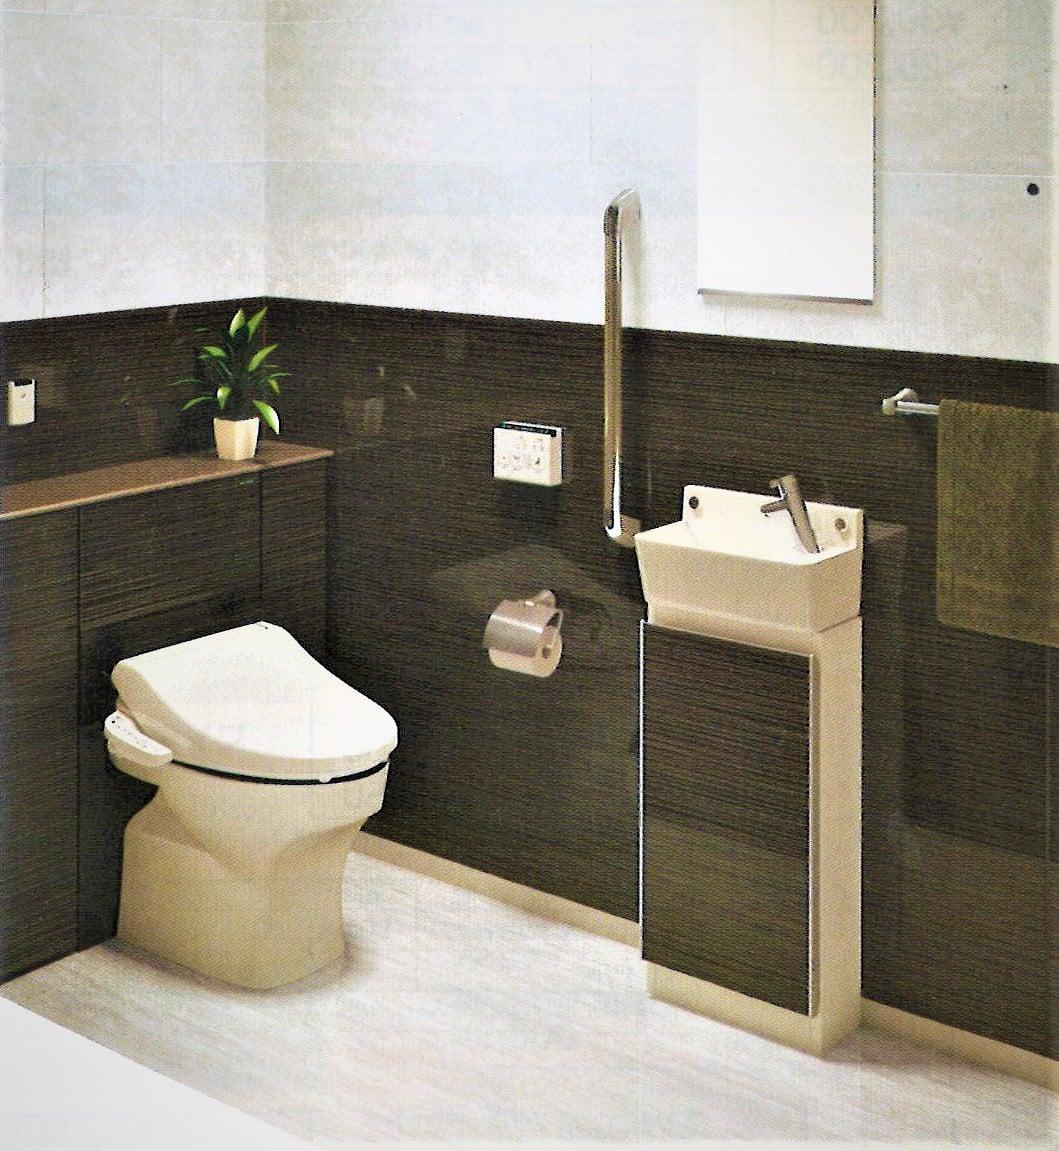 Takarastandard トイレ全面リフォーム 鮫島工業施工 ティモニCシリーズ 0.5坪 施工費込 リフォーム商品プランのイメージその1